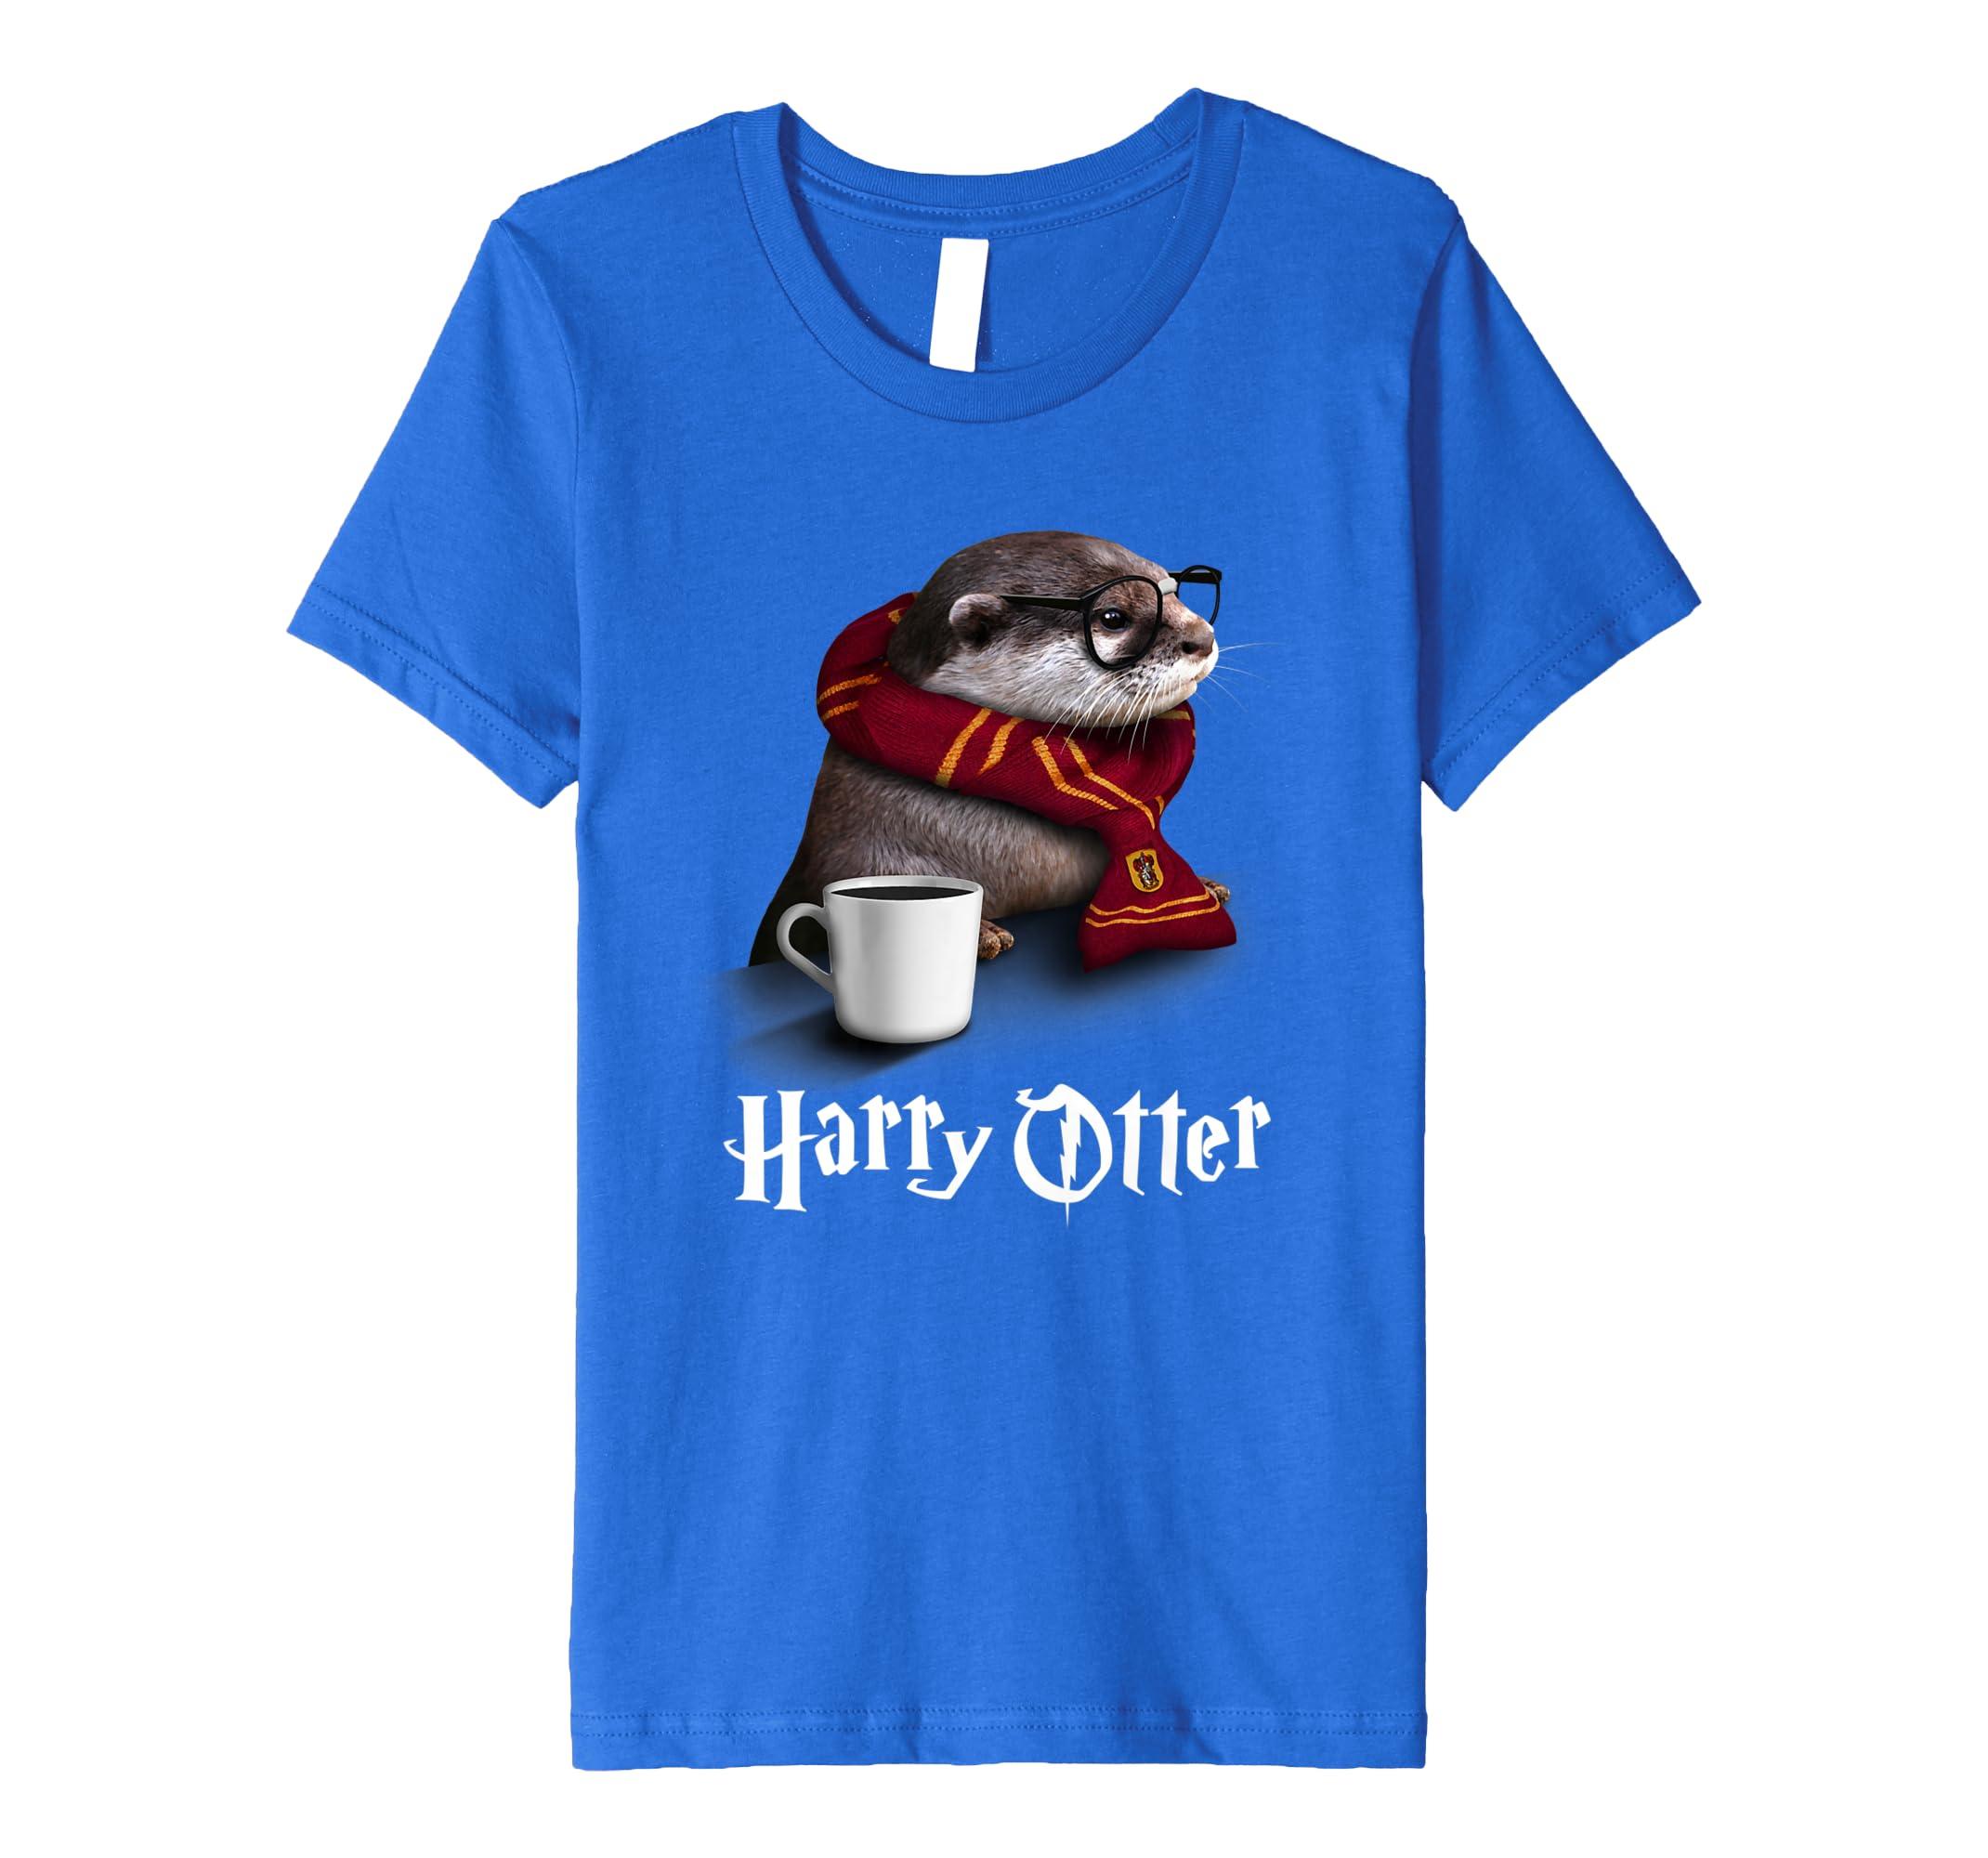 Funny Otter T-Shirt – Harry Otter Shirt für Otter Lover: Amazon.de ...